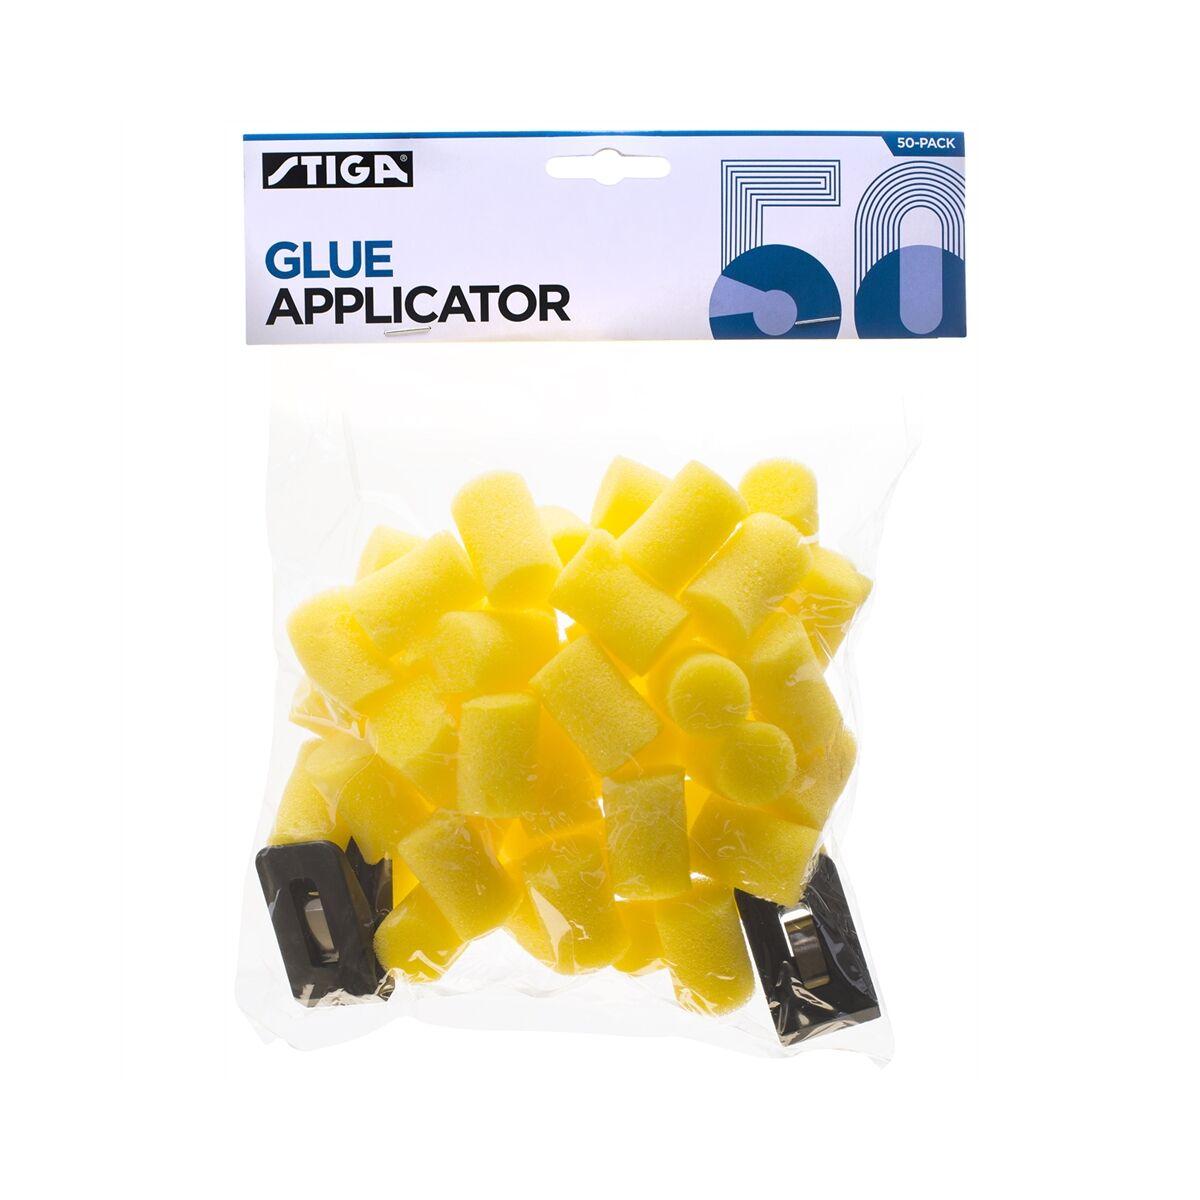 Stiga Glue Applicator 50-pack